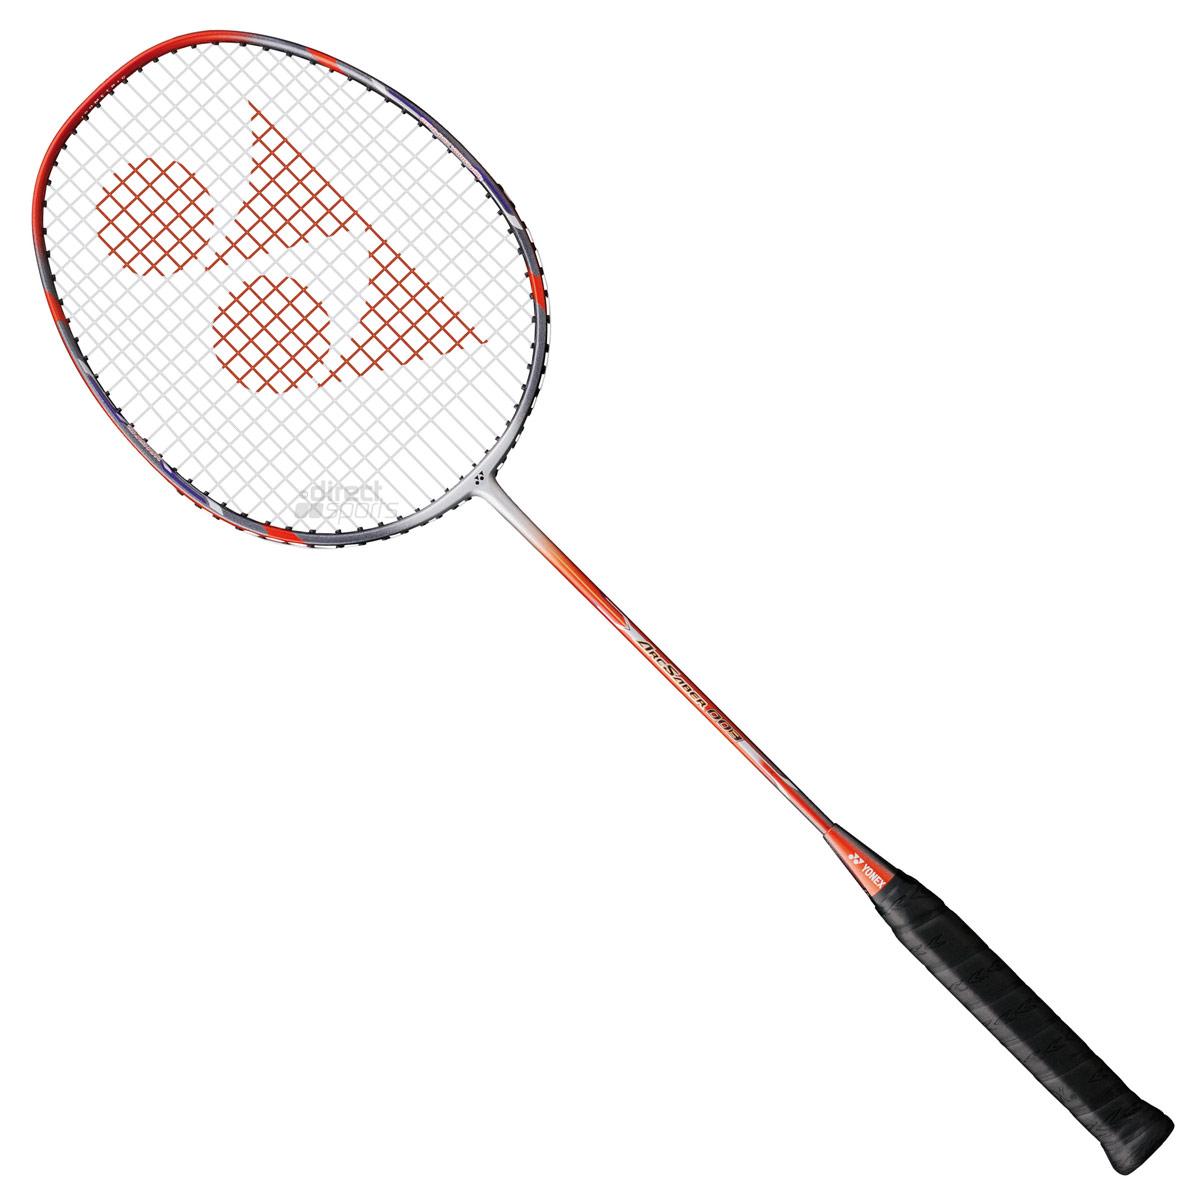 Yonex Arcsaber 003 Badminton Racquet - Paul Stewart ...